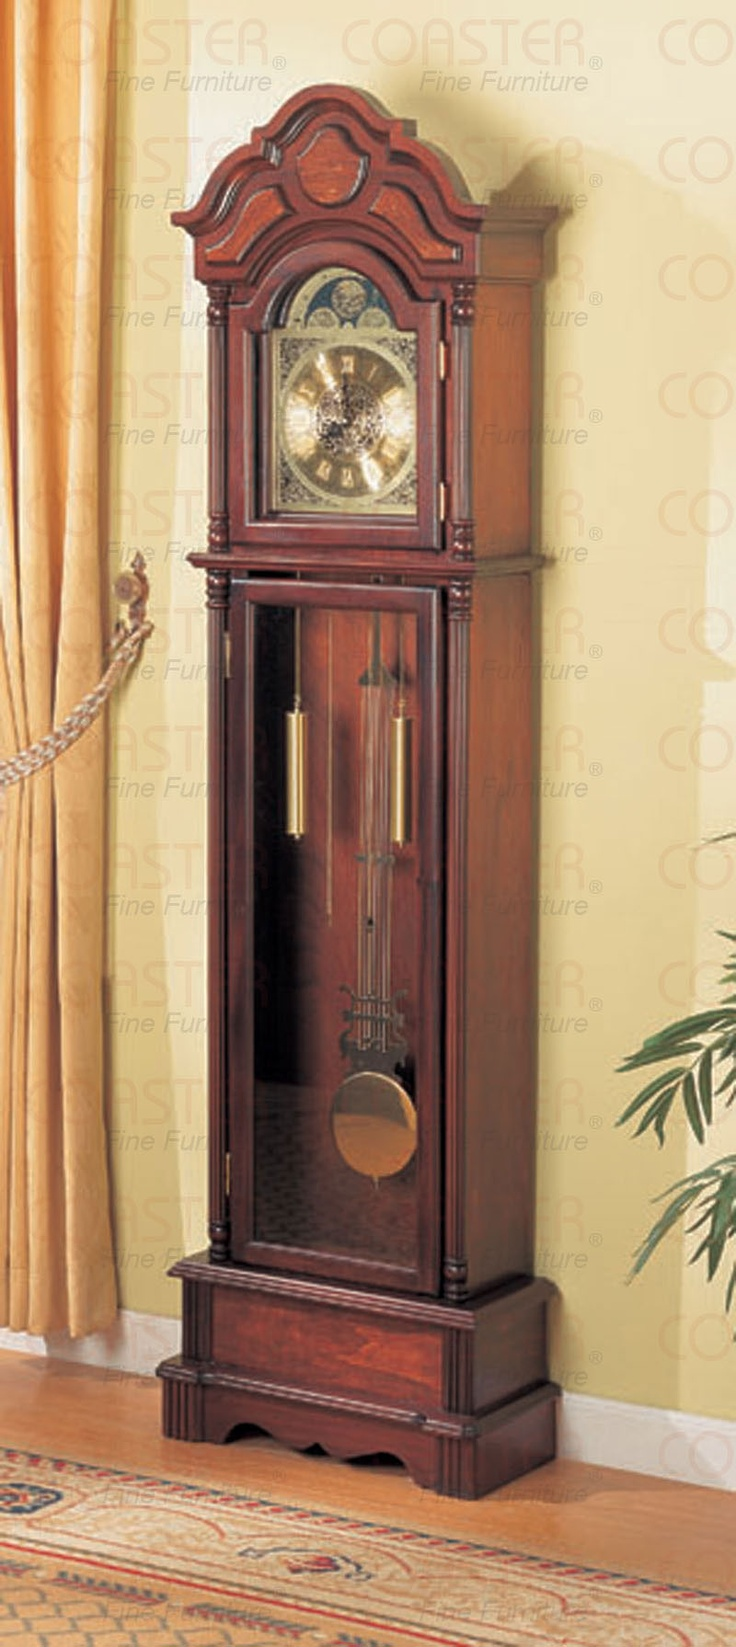 best grandfather clocks images on pinterest  antique clocks  - another grandfather clock